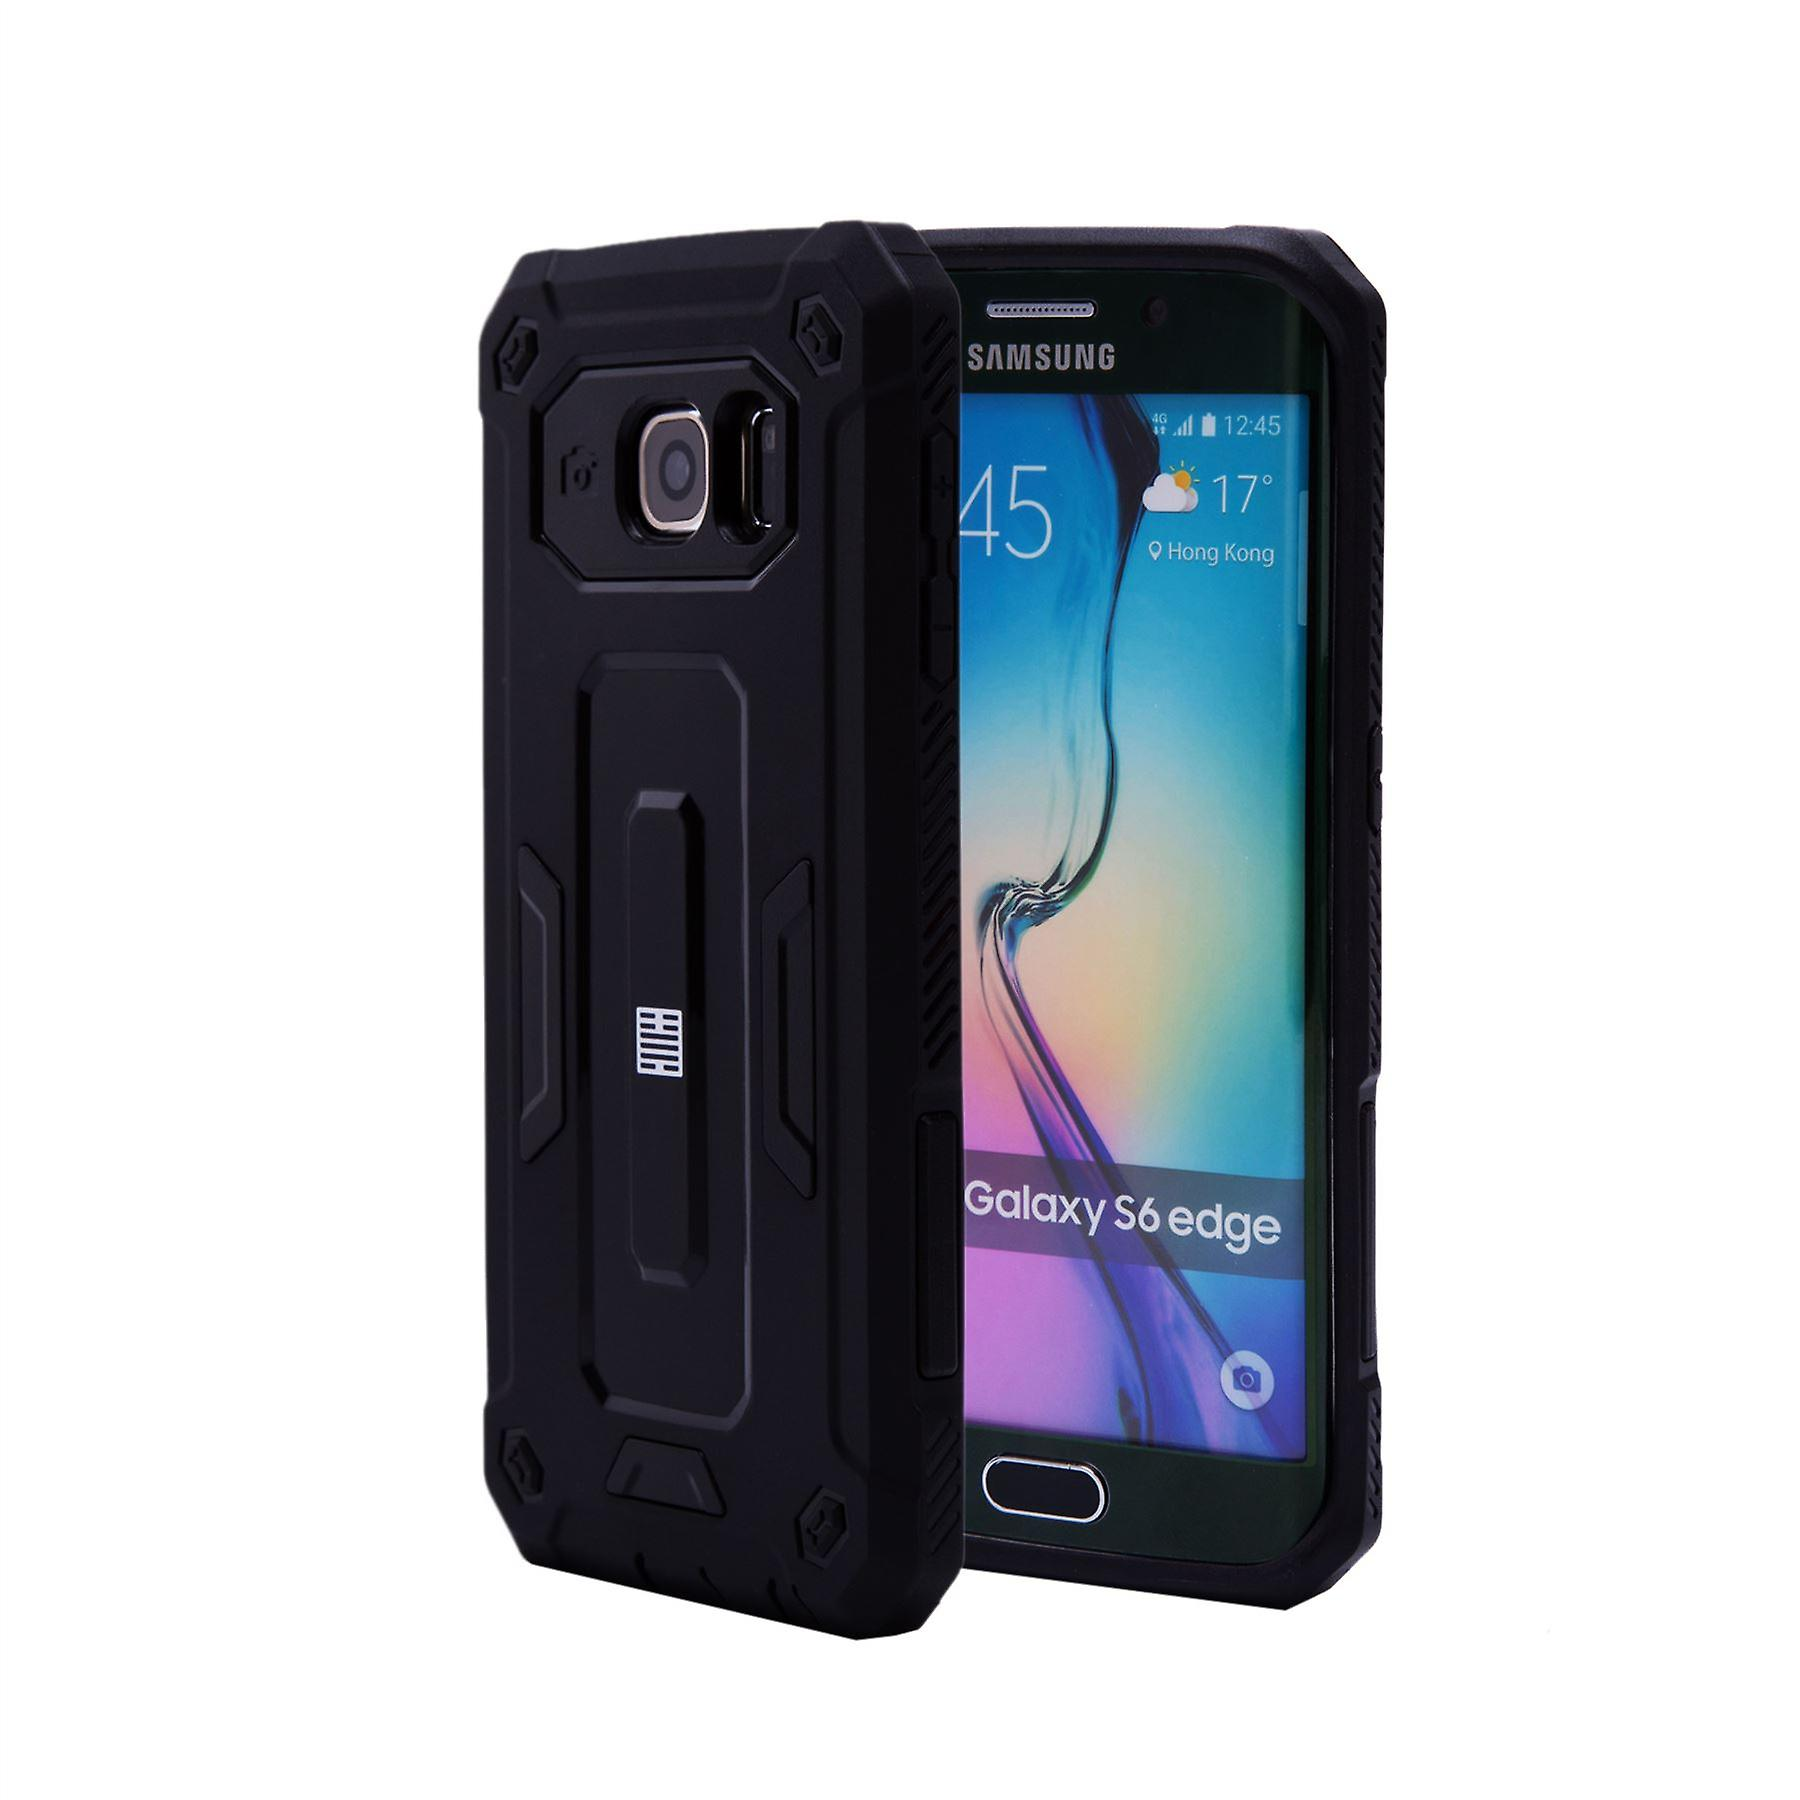 32nd Hard Defender case for Samsung Galaxy S6 Edge (SM-G925) - Black